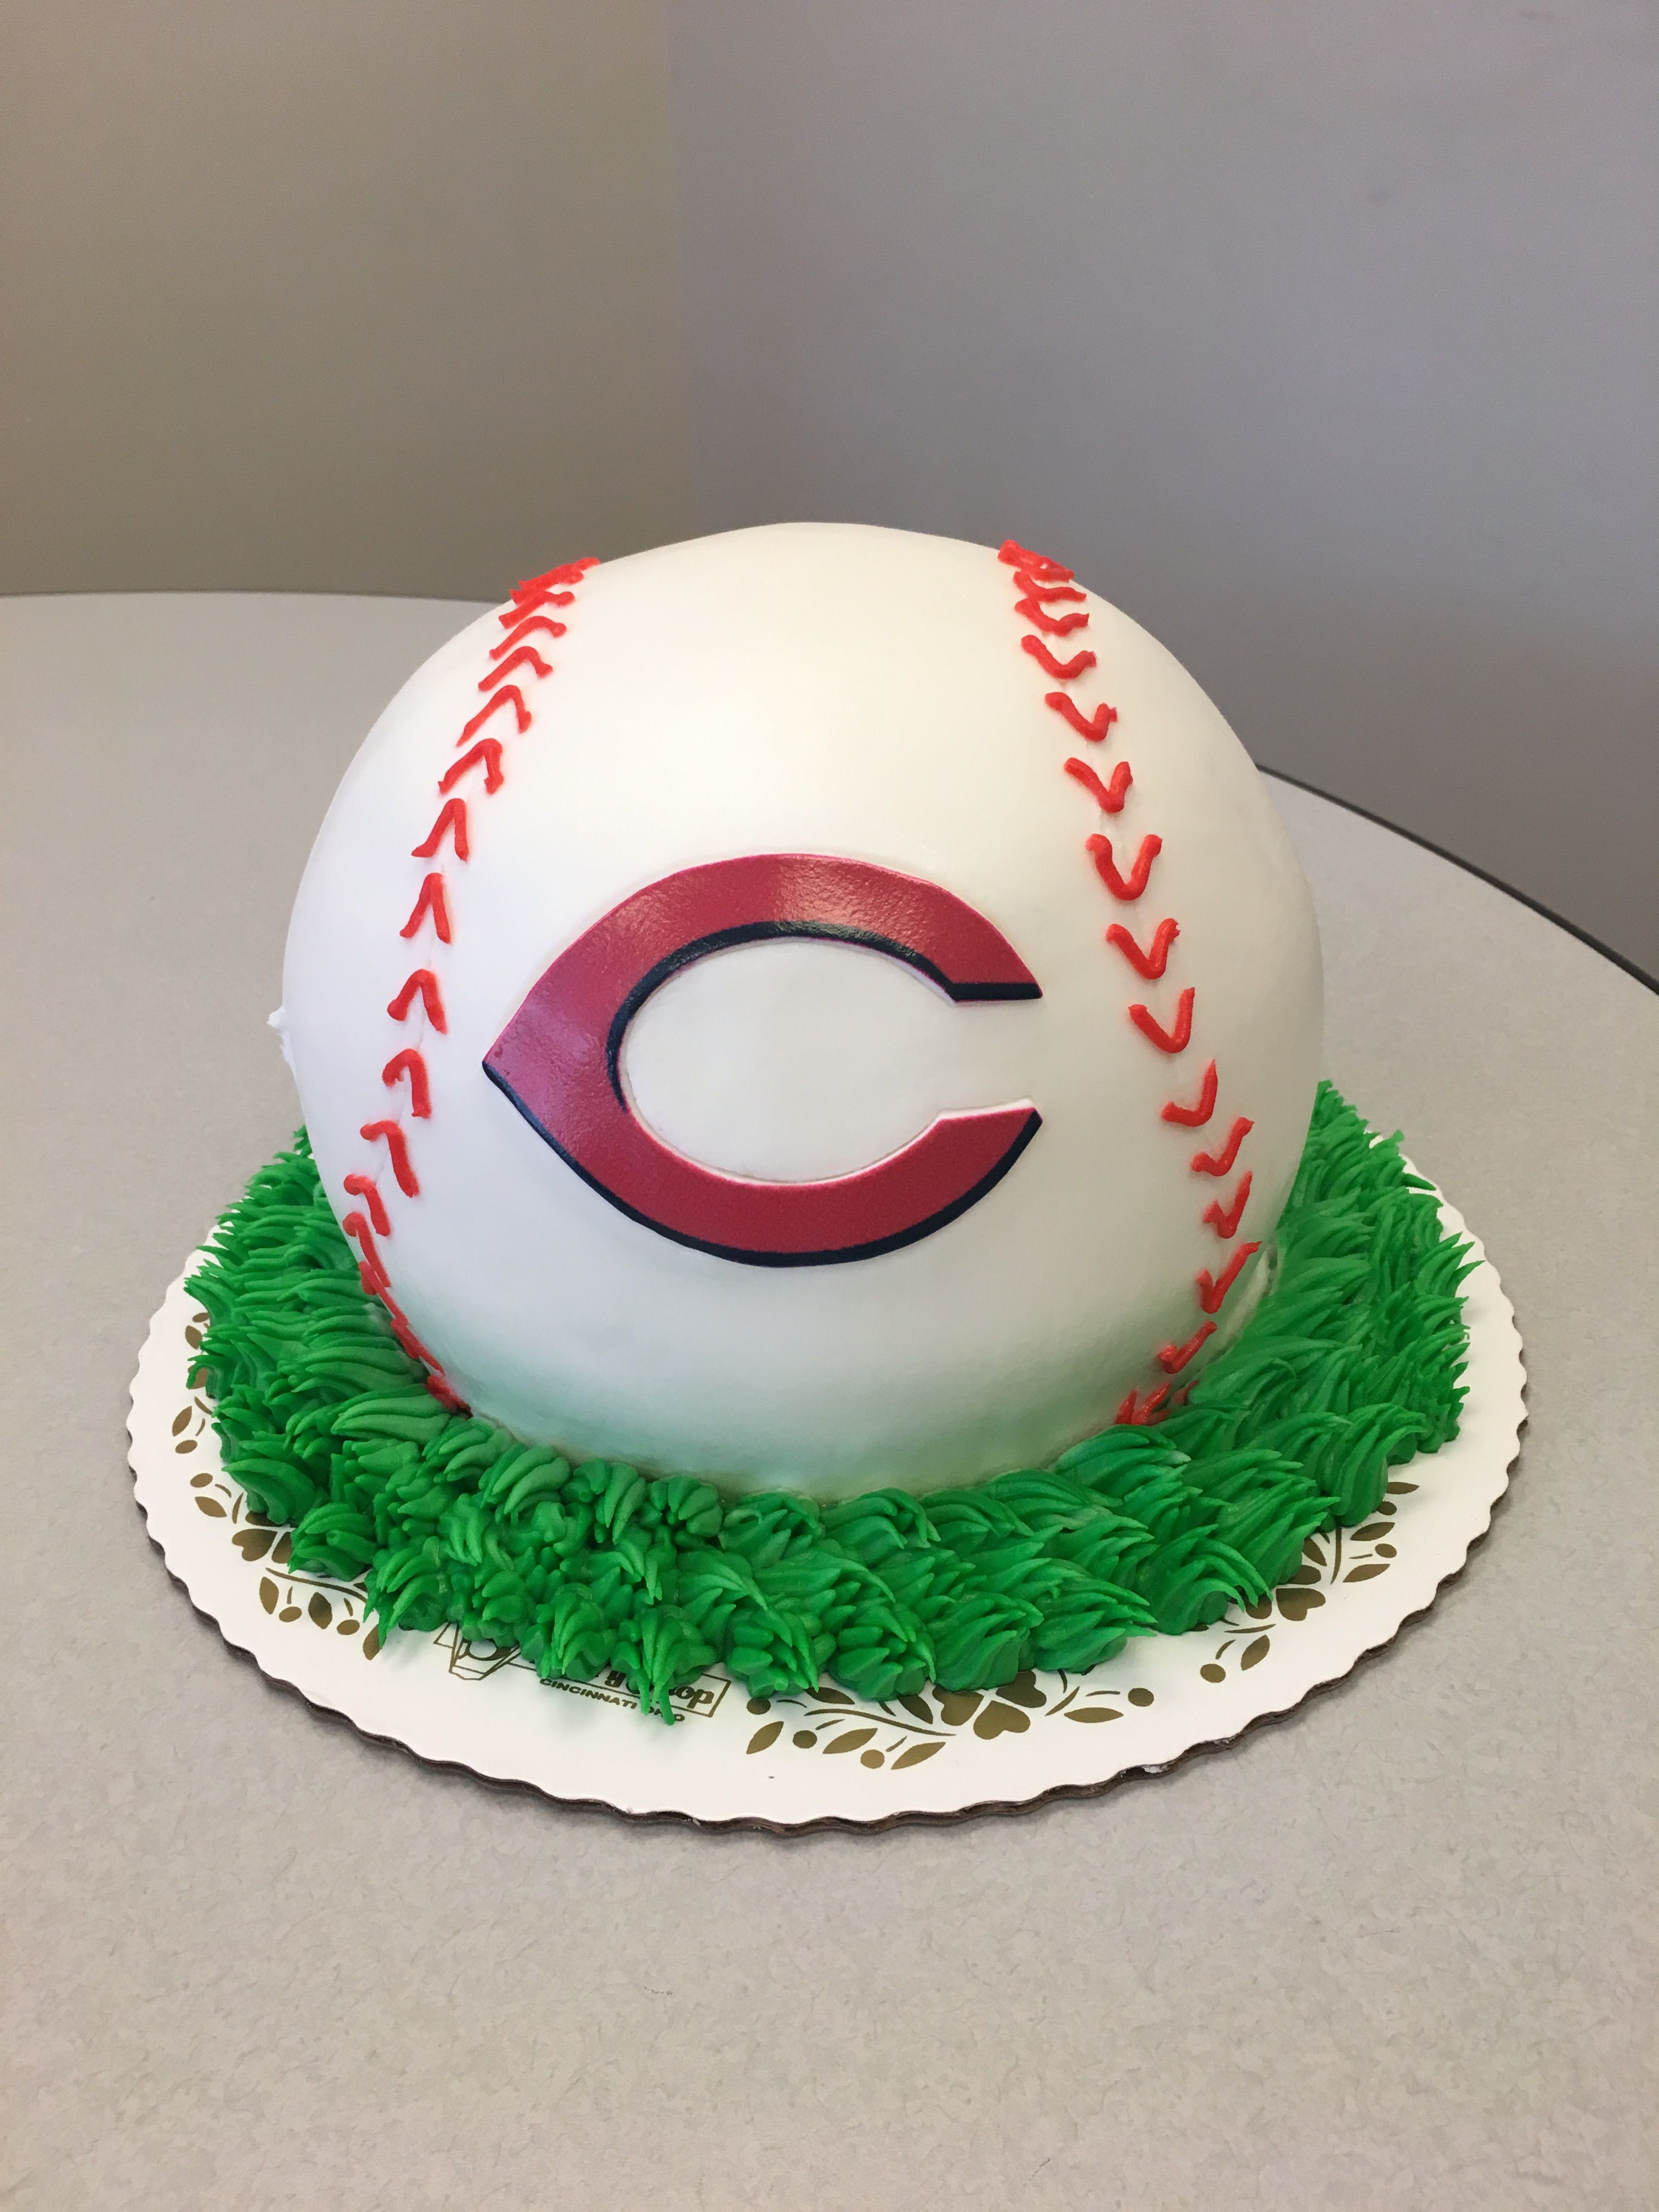 Peachy Cincinnati Reds Baseball Cake Red Birthday Party Red Birthday Personalised Birthday Cards Paralily Jamesorg